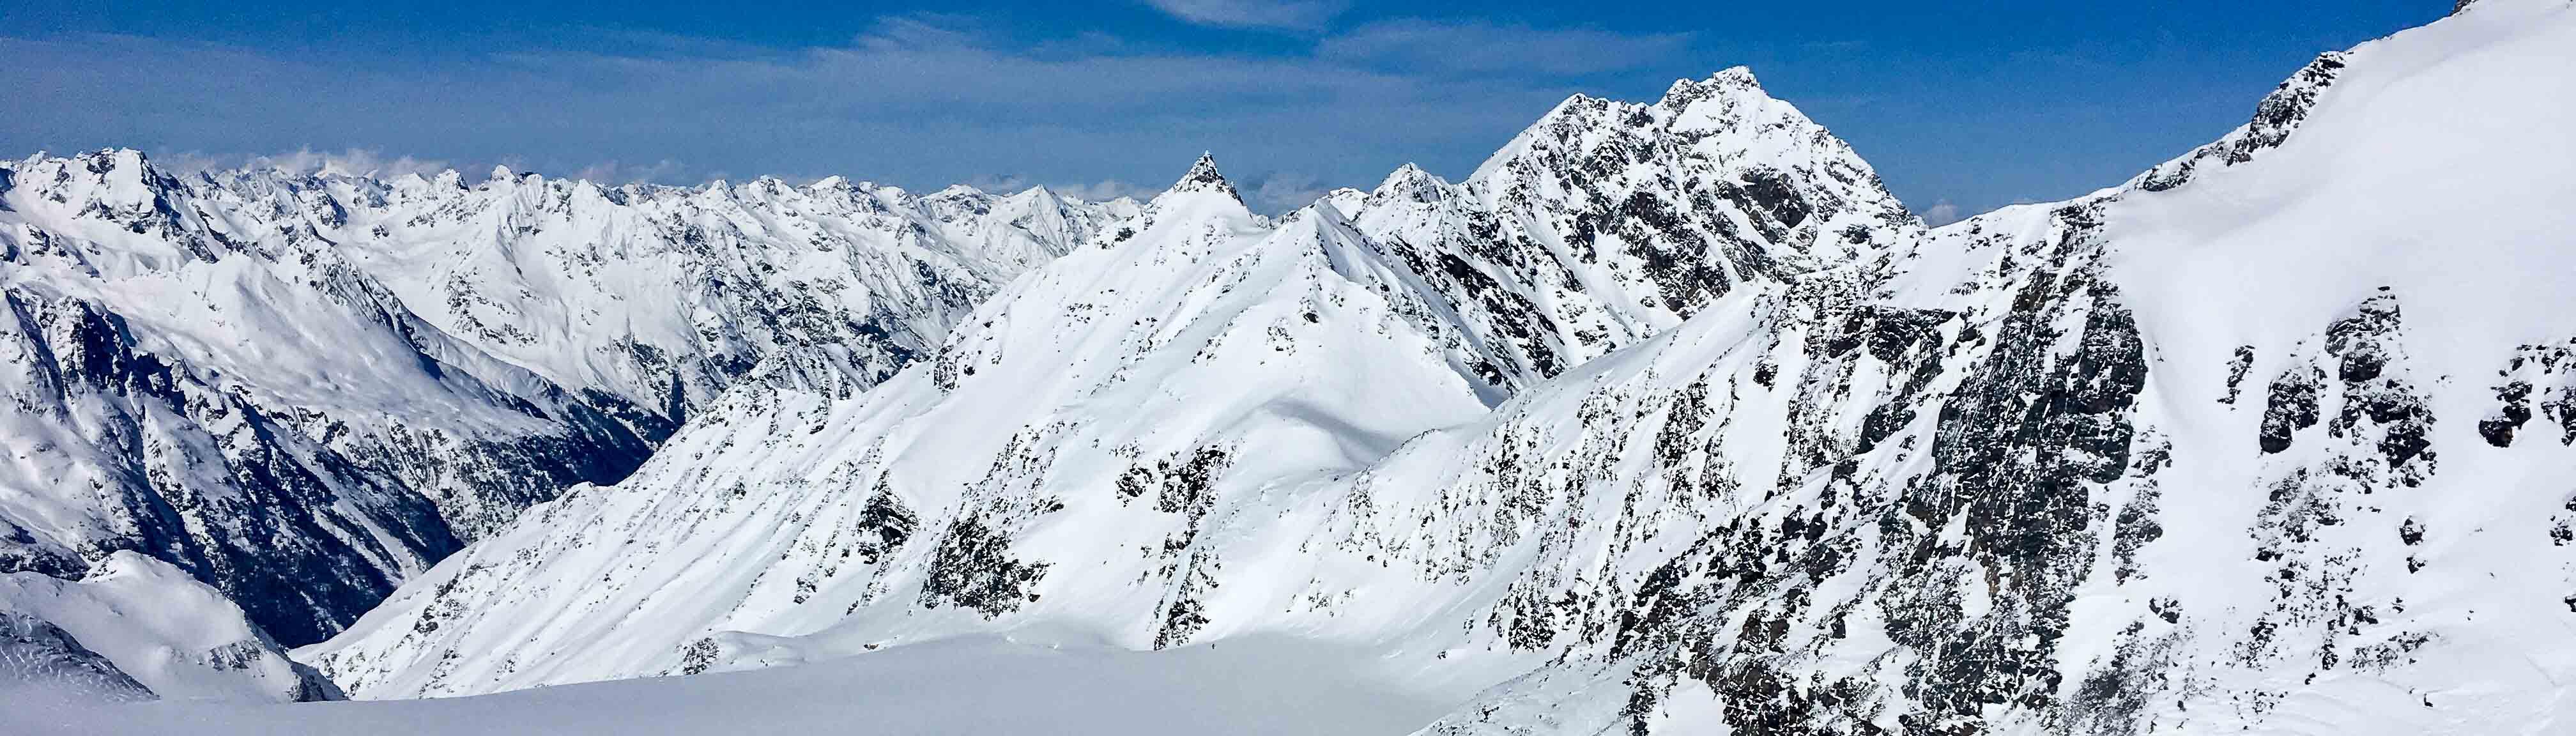 skitour transalp innsbruck-meran-3